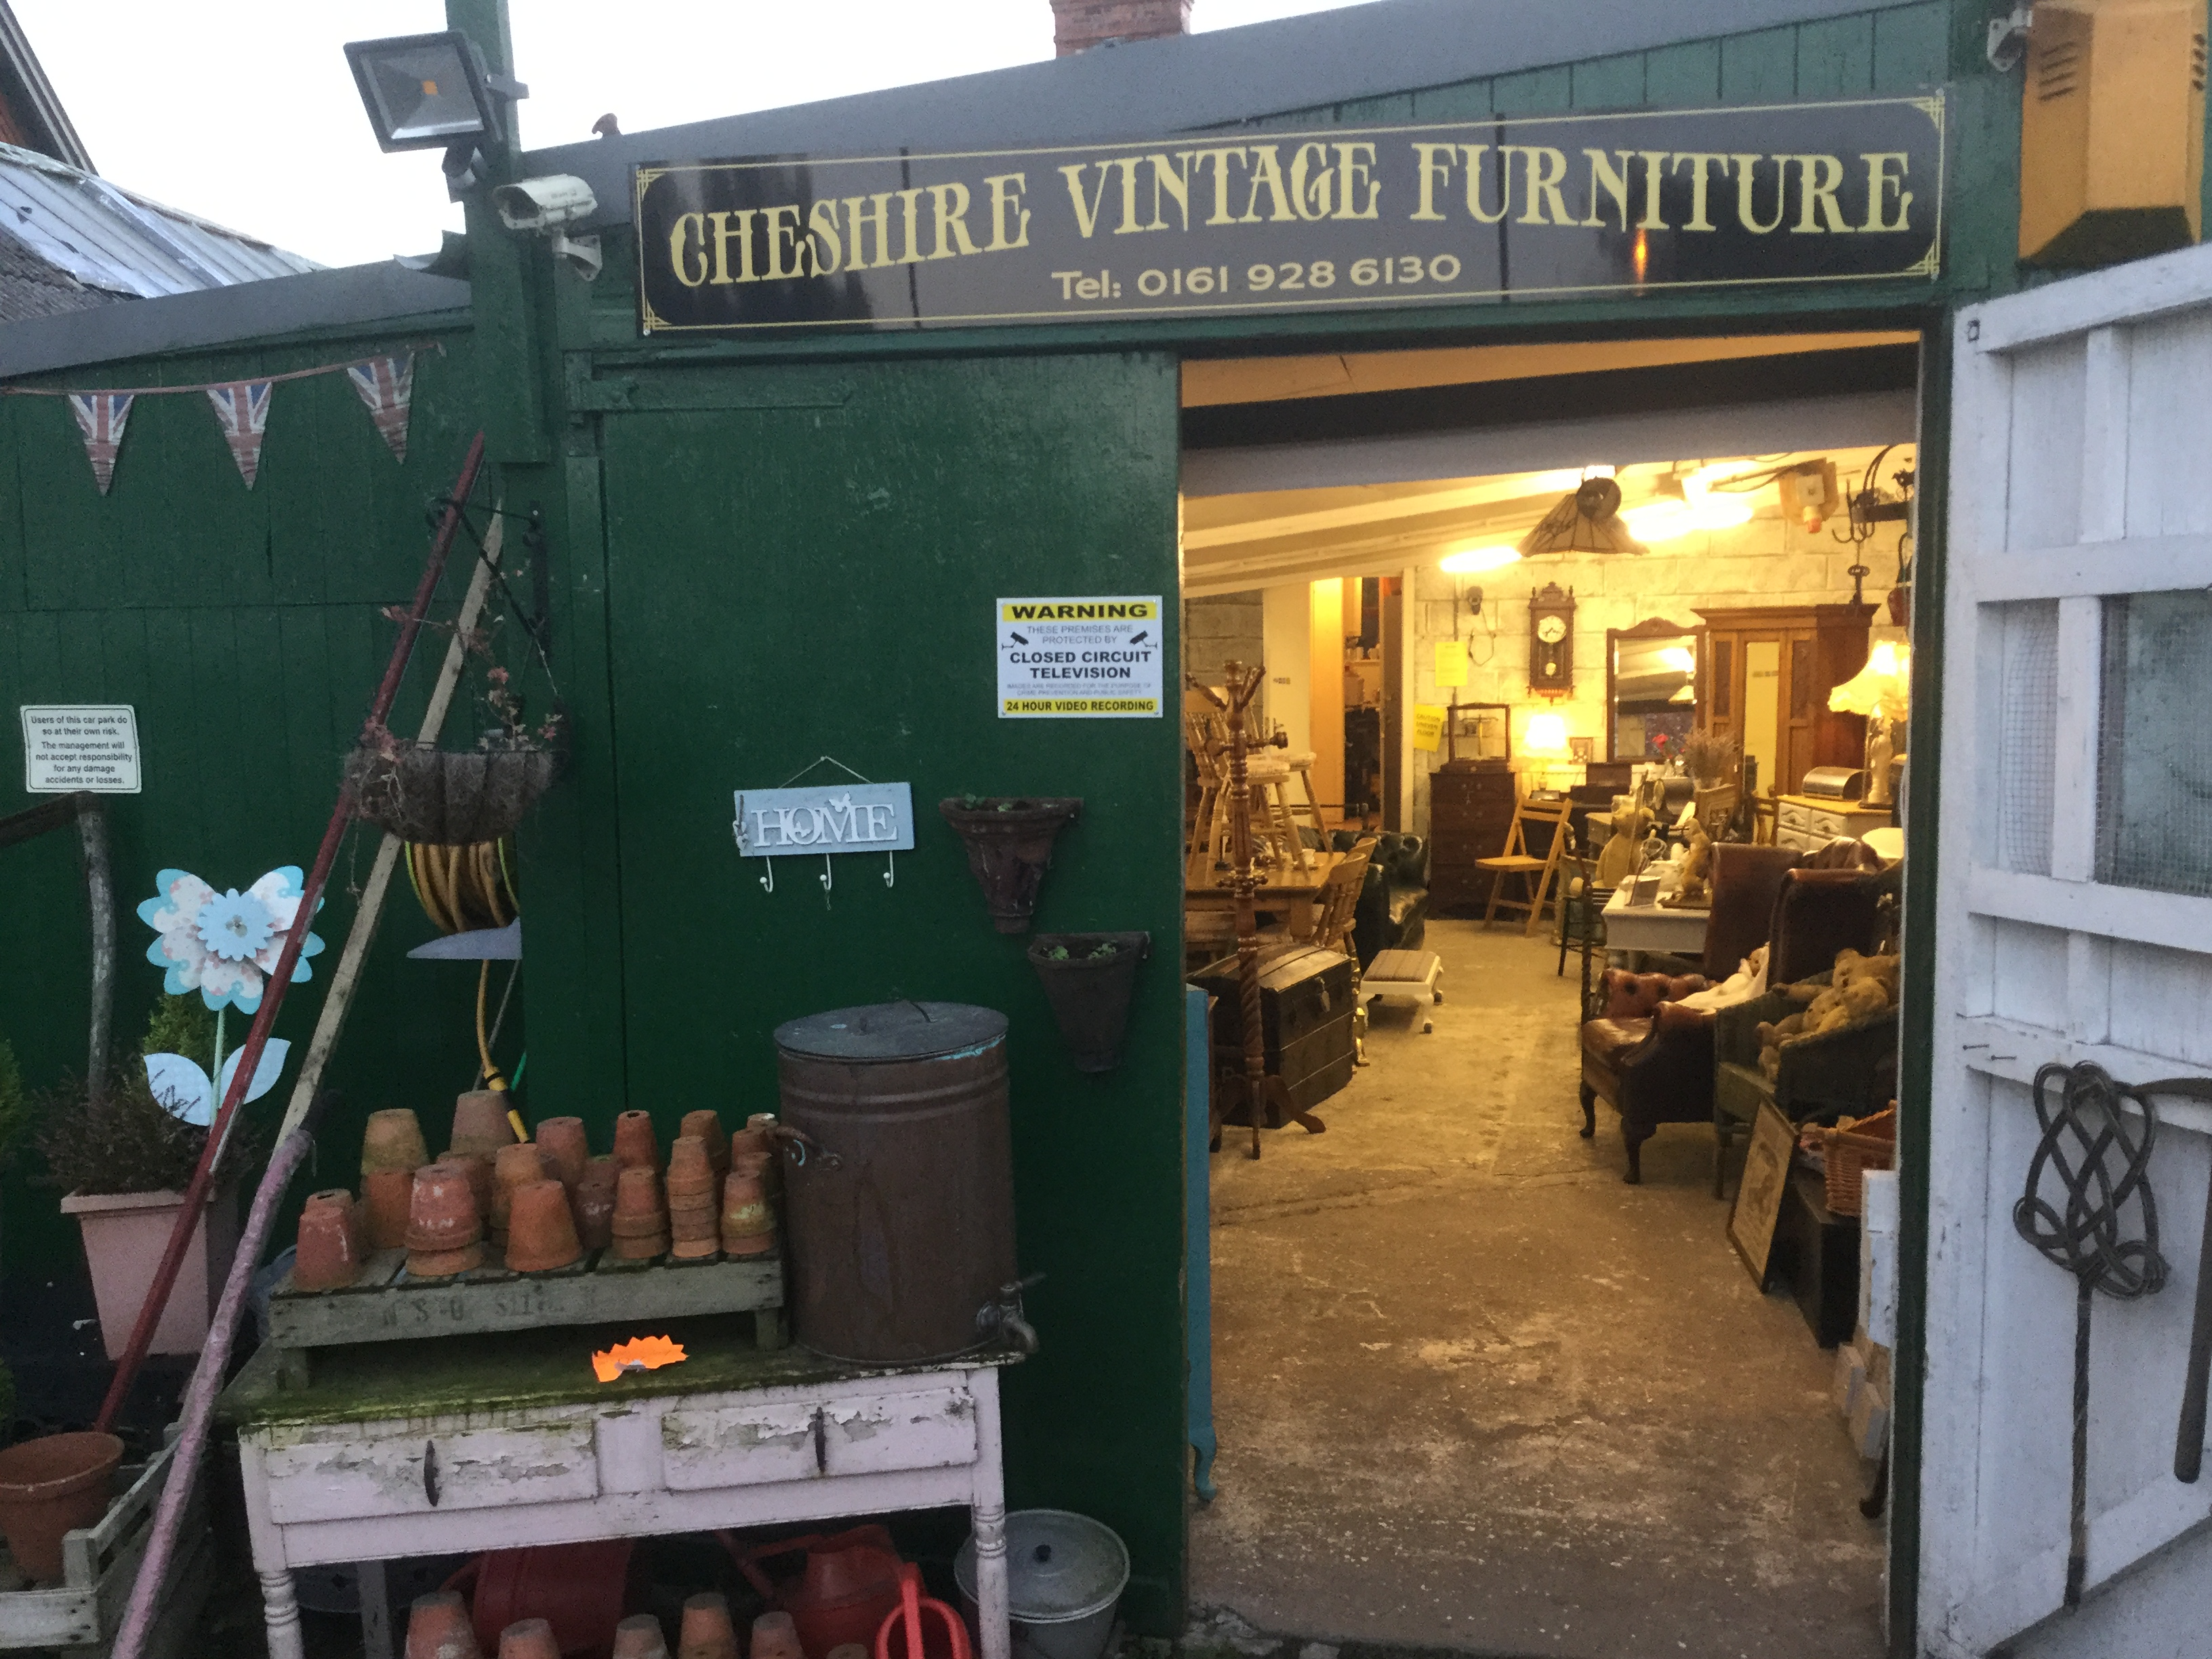 Cheshire vintage furniture